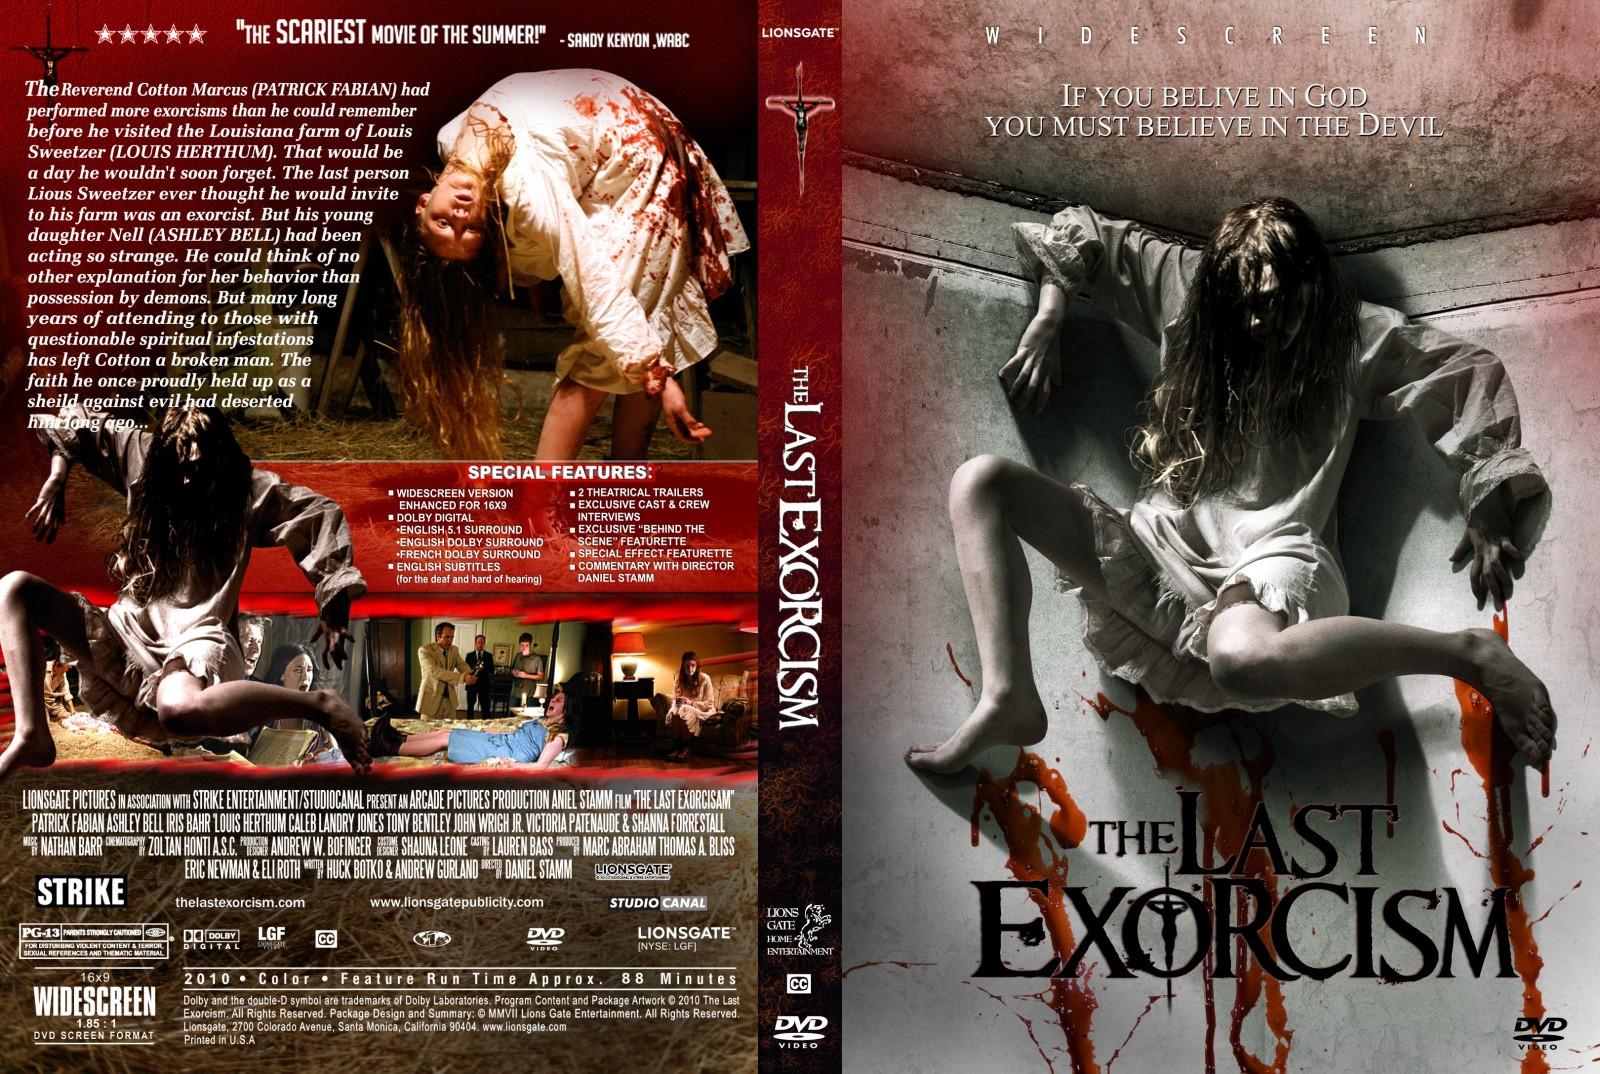 The Last Exorcism 2010 Photo Gallery Imdb